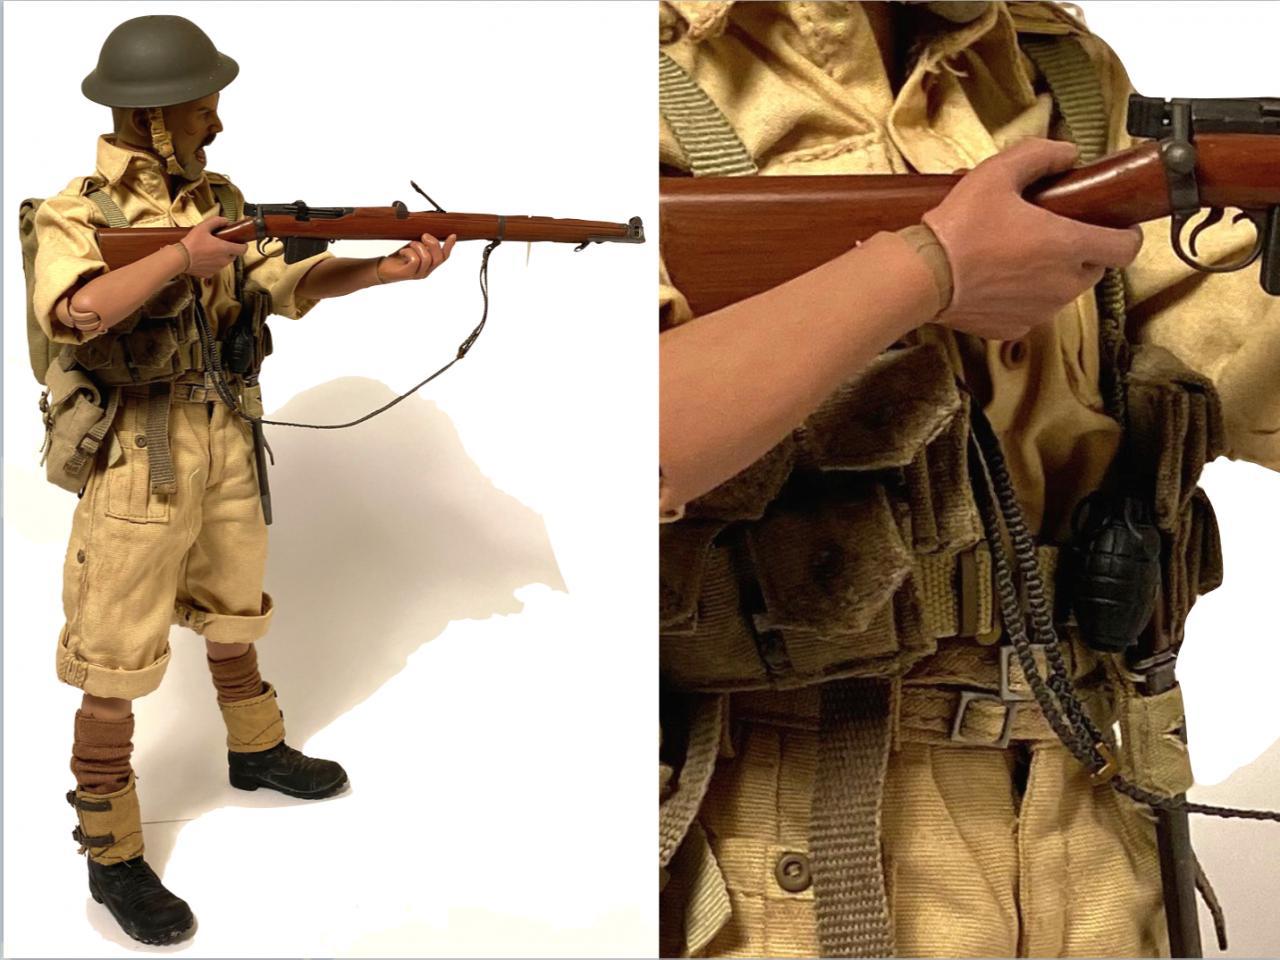 1942 Malaya. No Surrender-screen-shot-2020-05-21-10-52-33-am-jpg